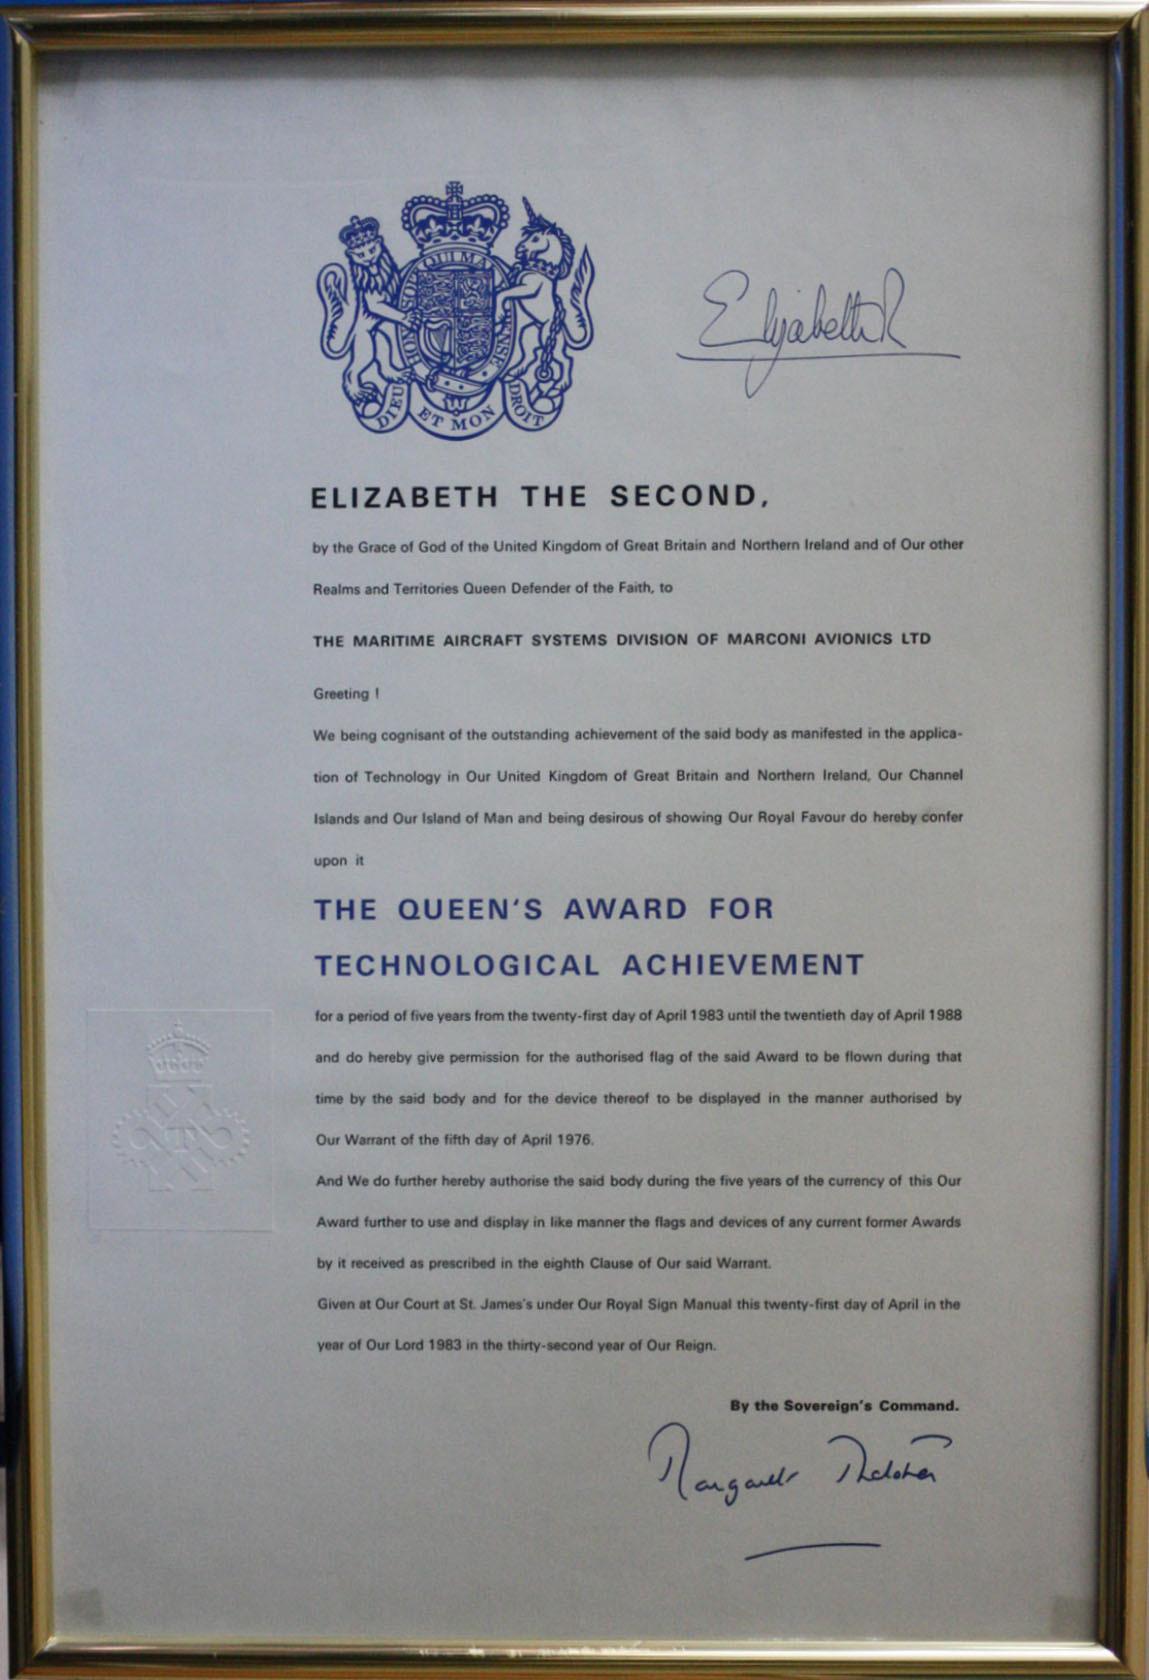 Queen's Award for Technological Achievement 1983